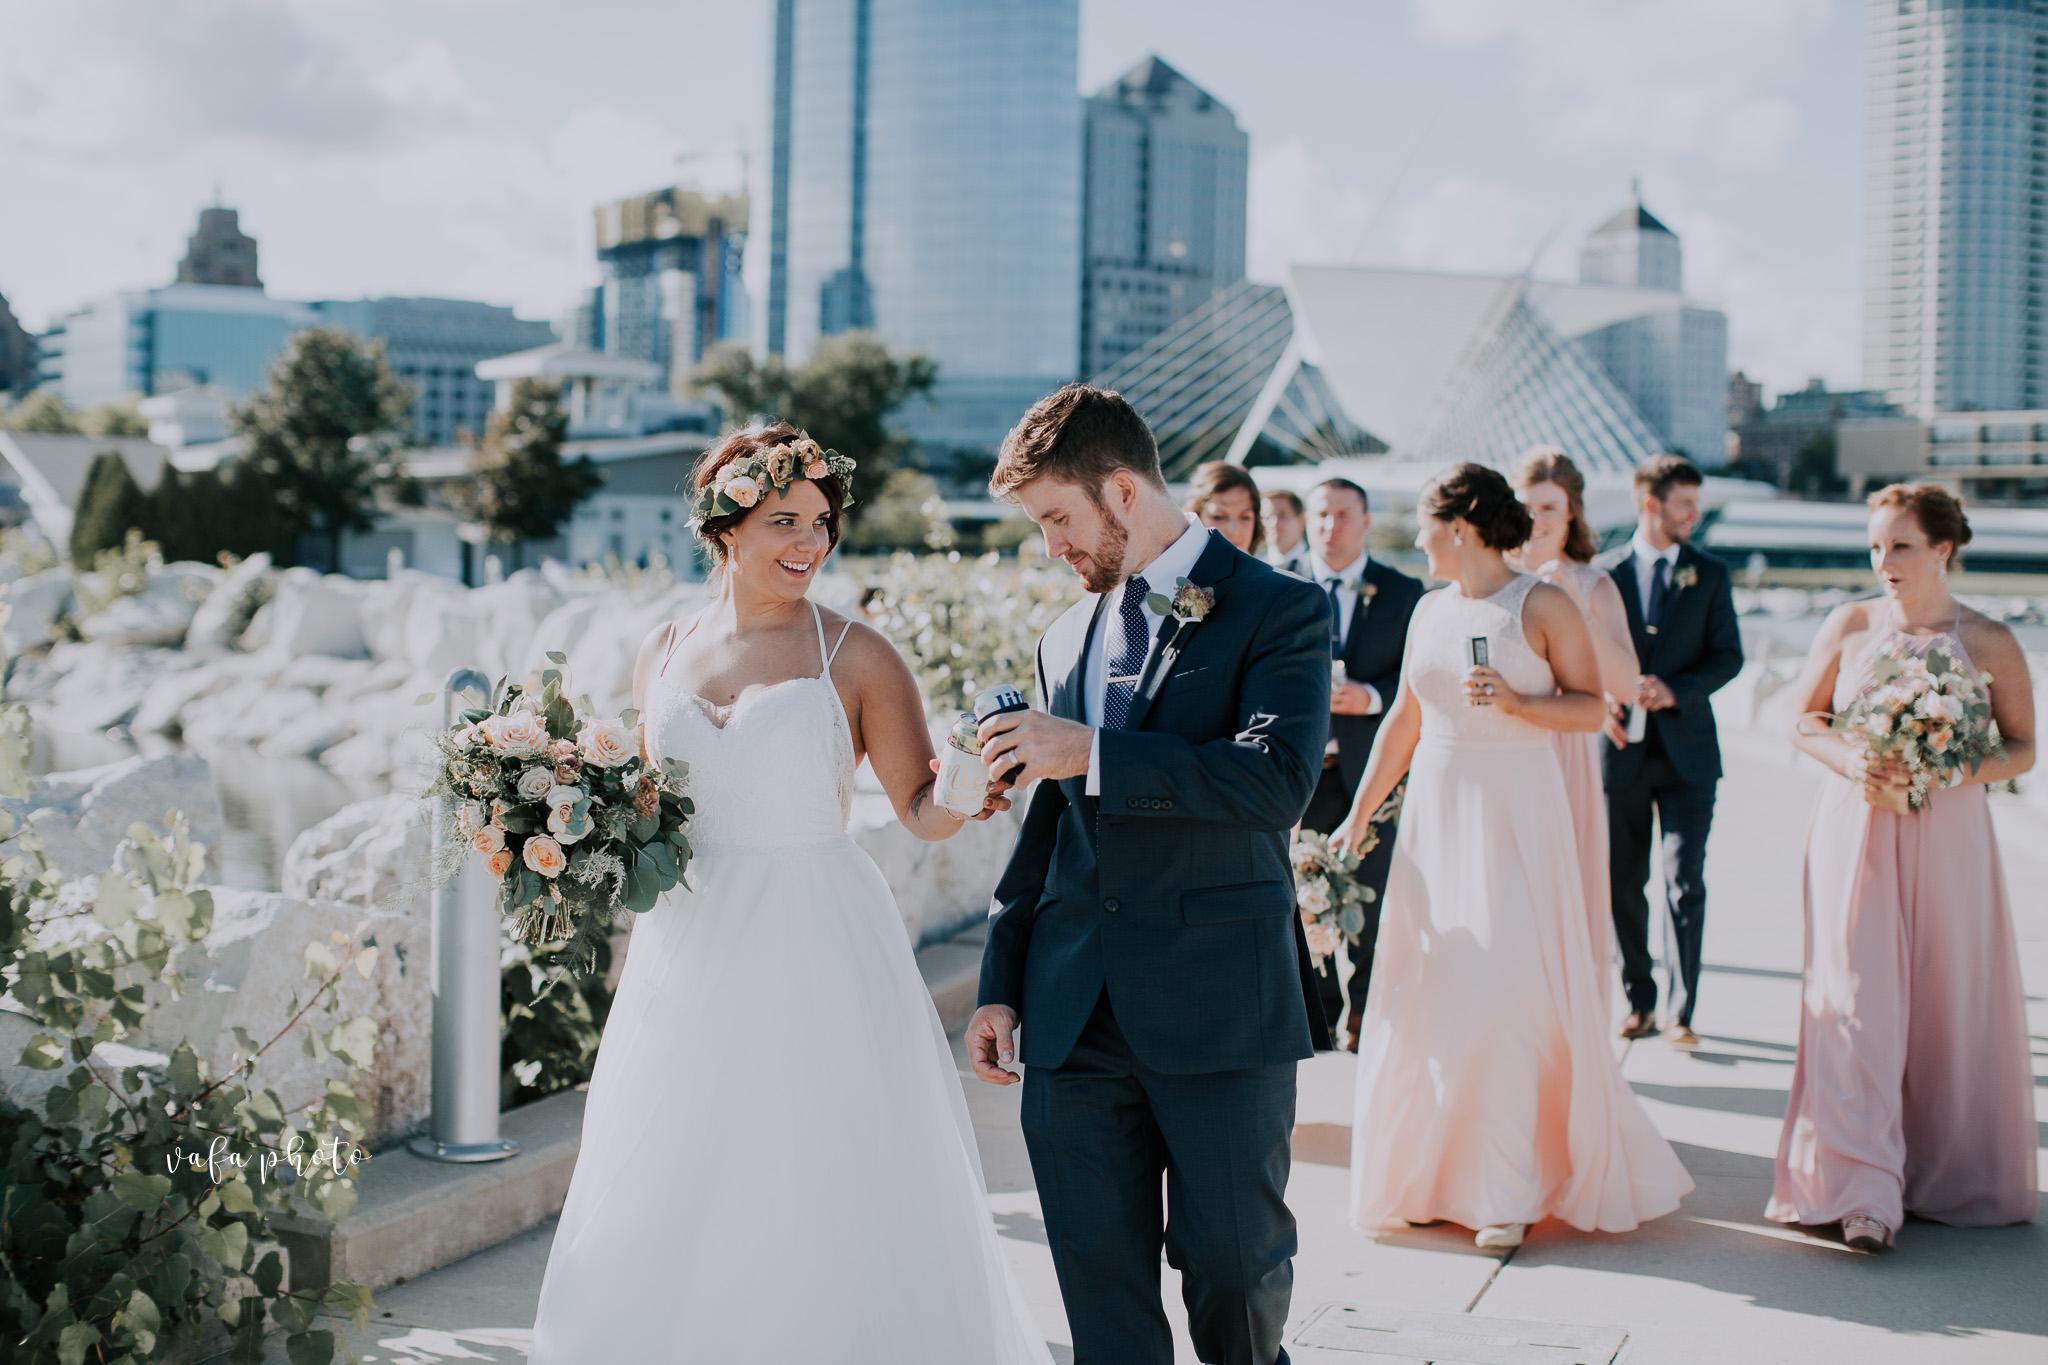 Milwaukee-Athletic-Club-Wedding-Amanda-Tony-Vafa-Photo-555.jpg